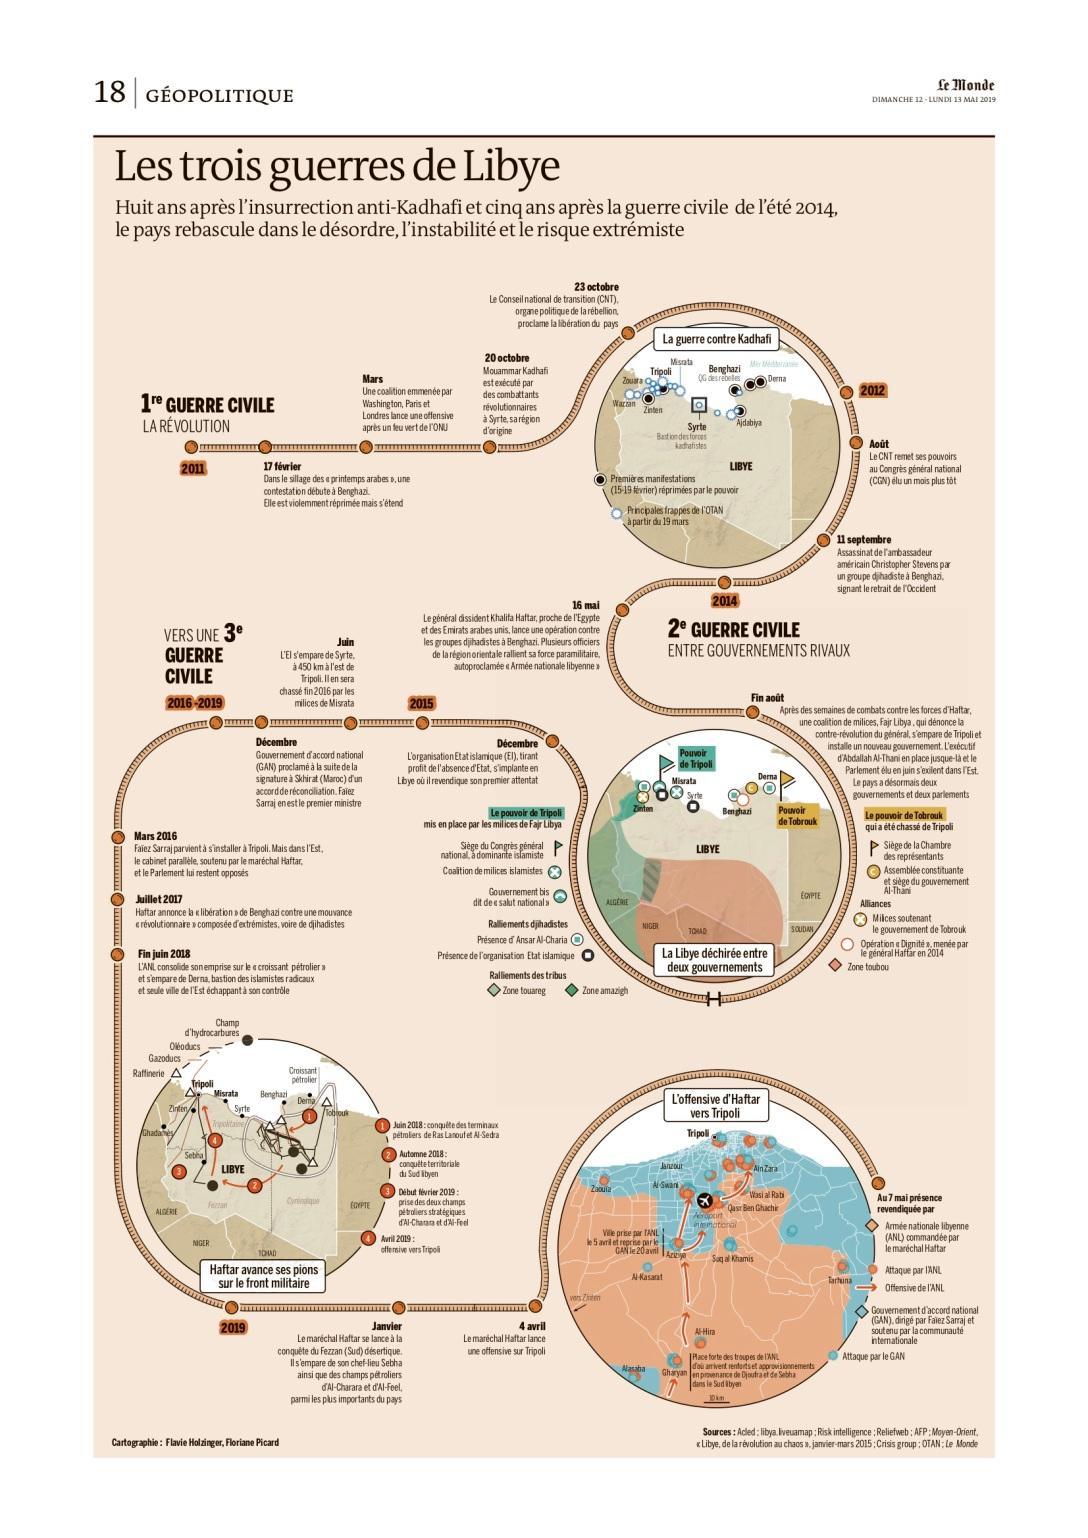 20190513_Le Monde Libia infografie